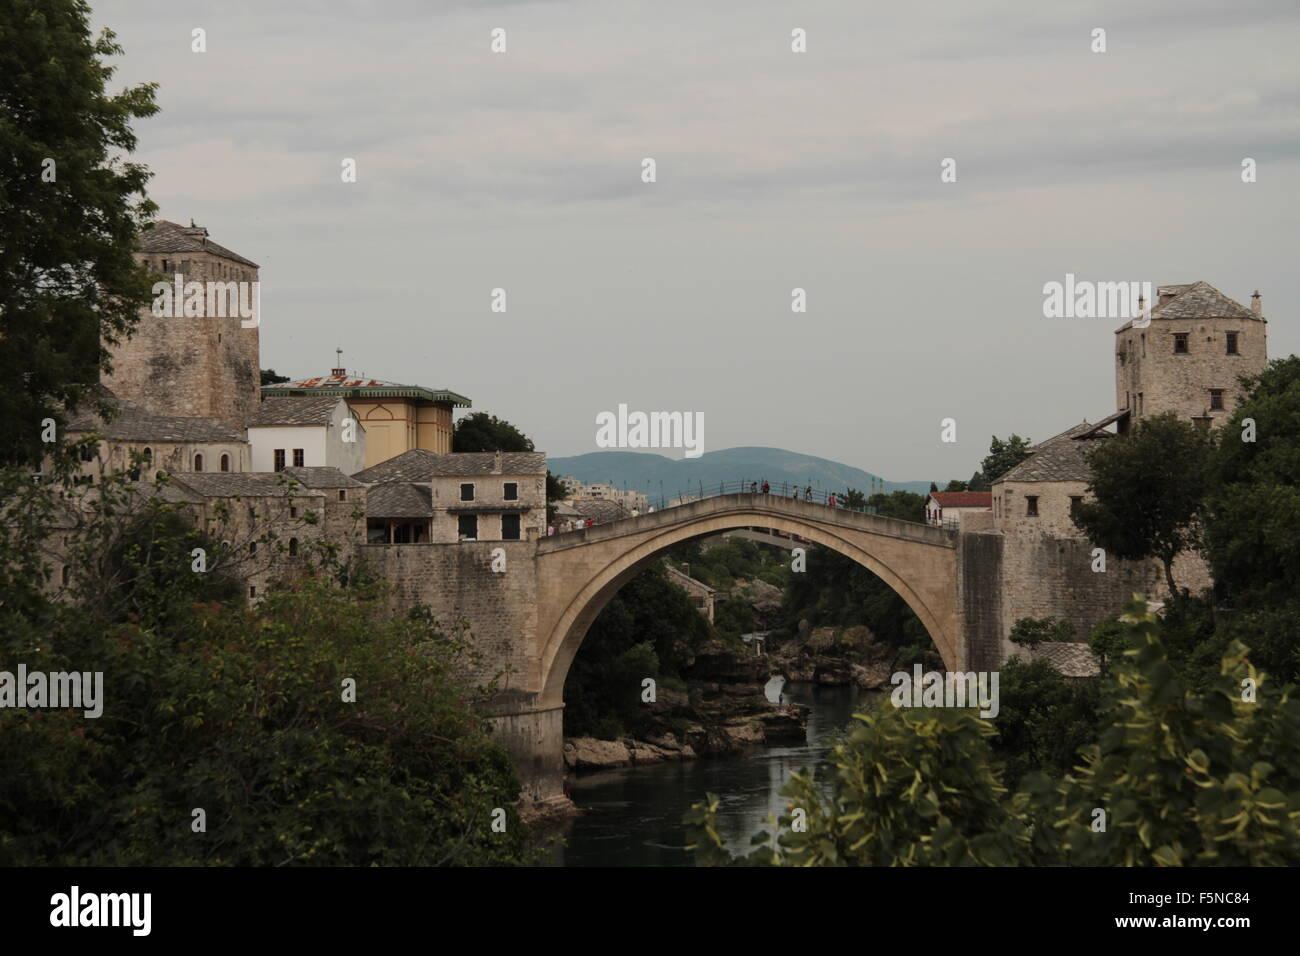 Stari Most Neretva River Mostar Bosnia - Stock Image